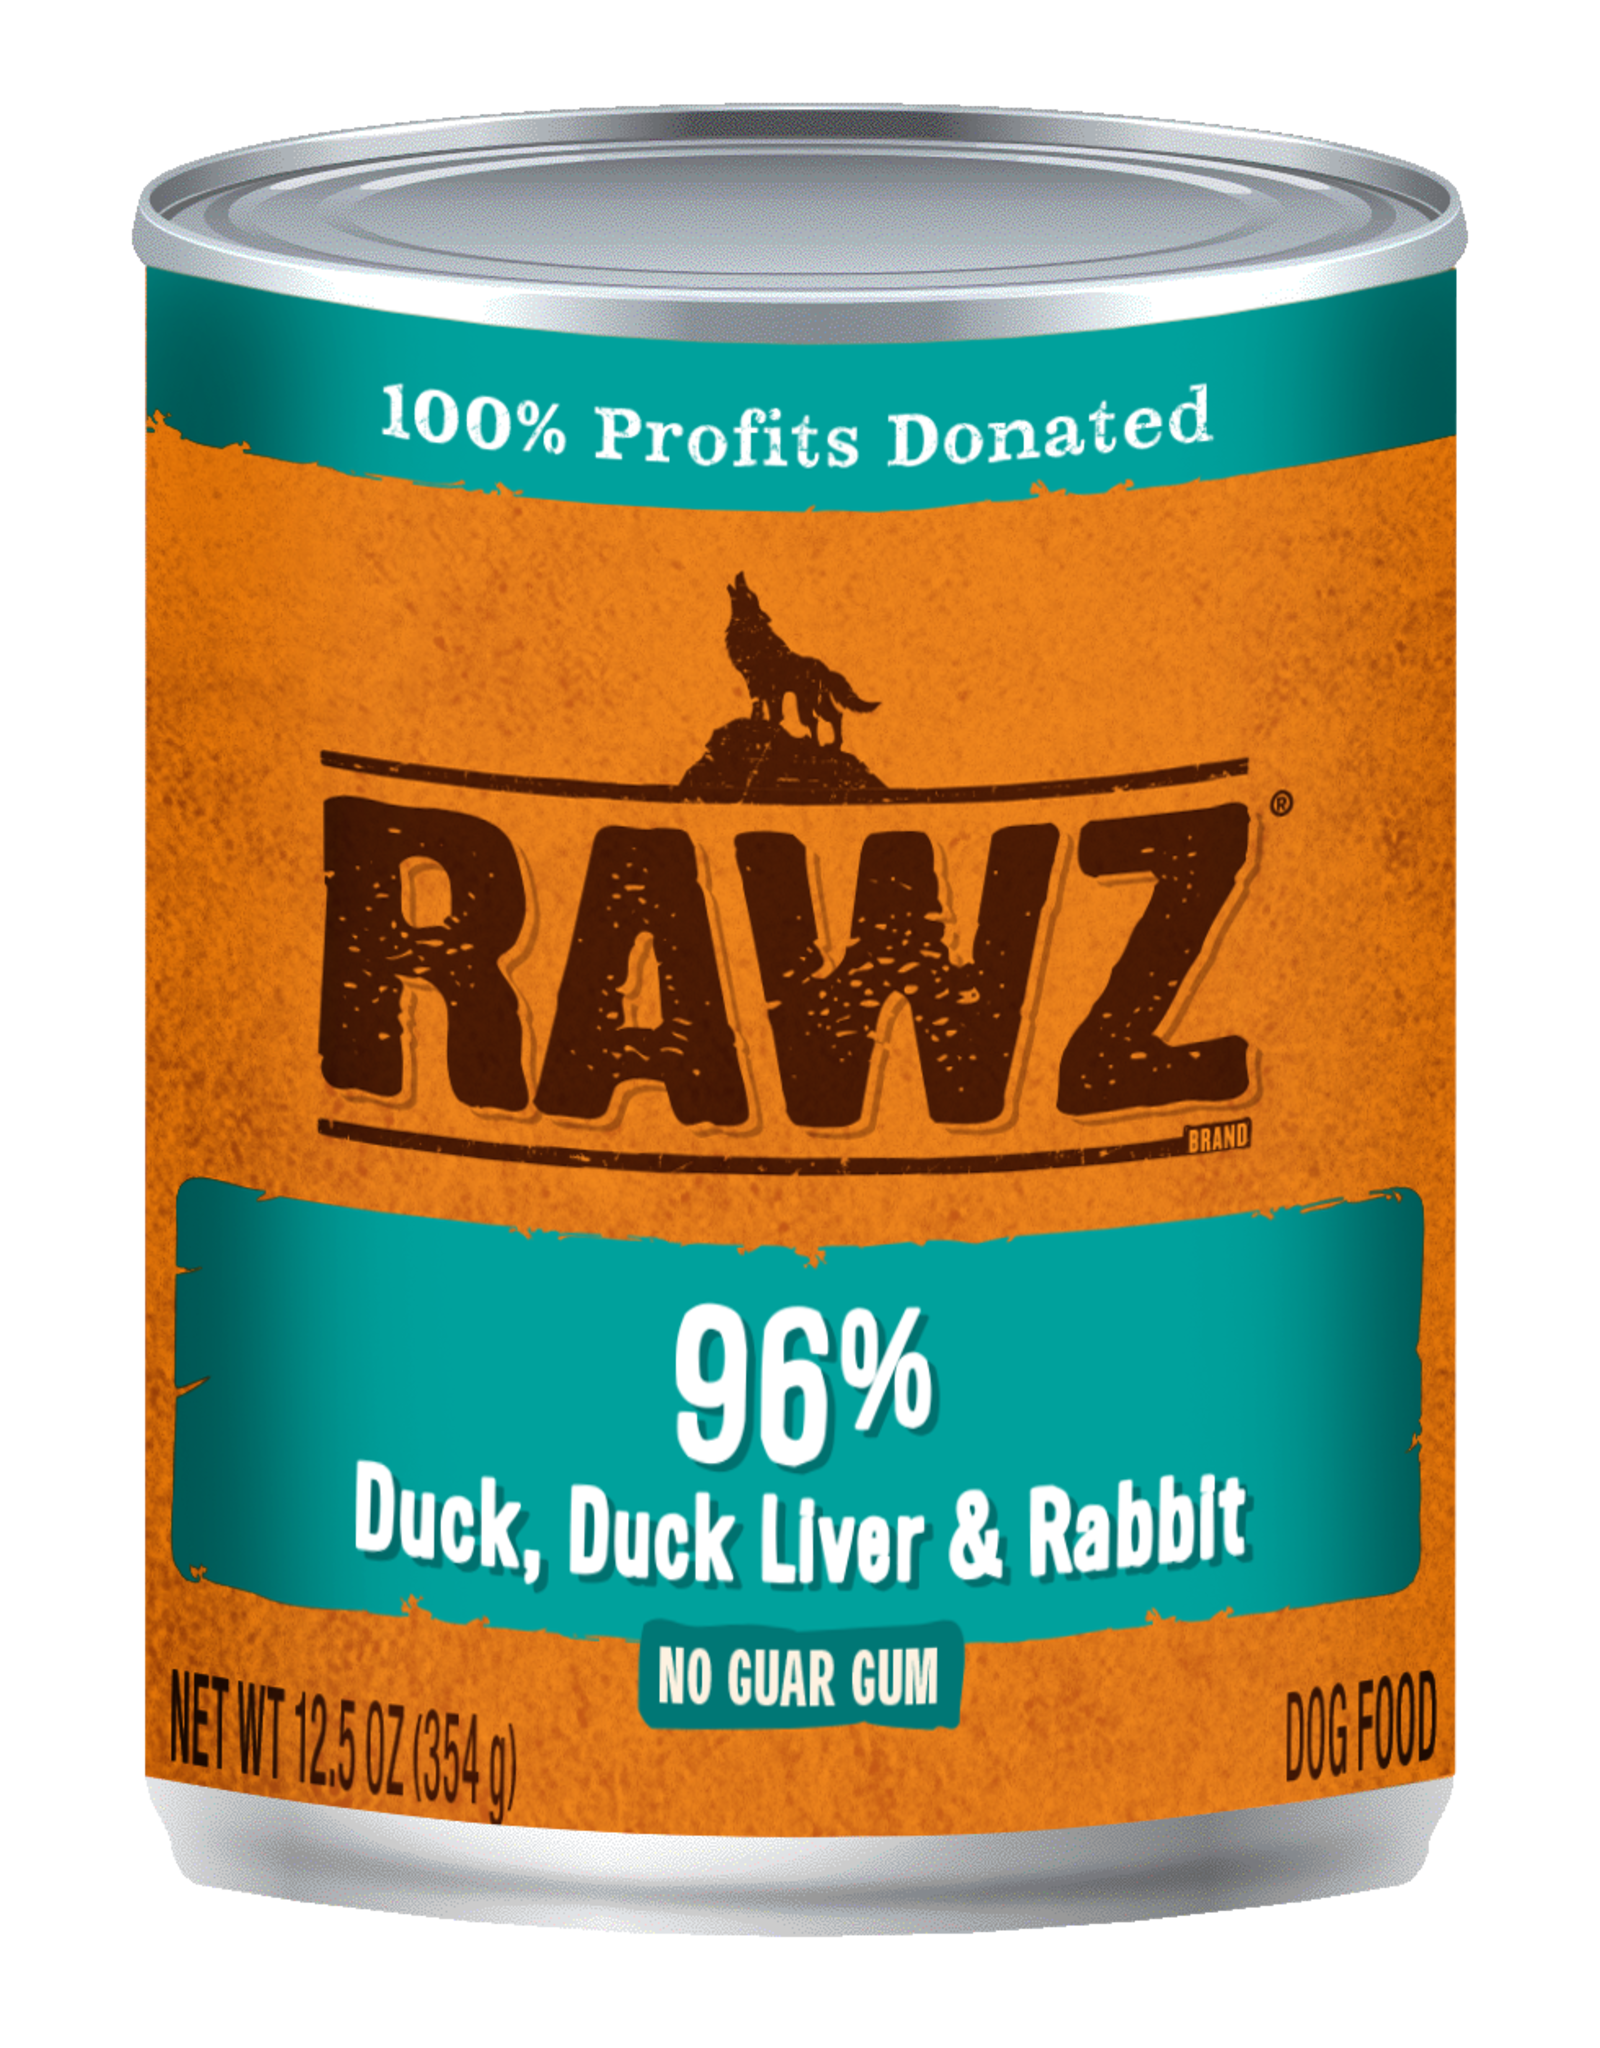 Rawz Rawz K9 96% Duck, Duck Liver, & Rabbit Pate 12.5oz